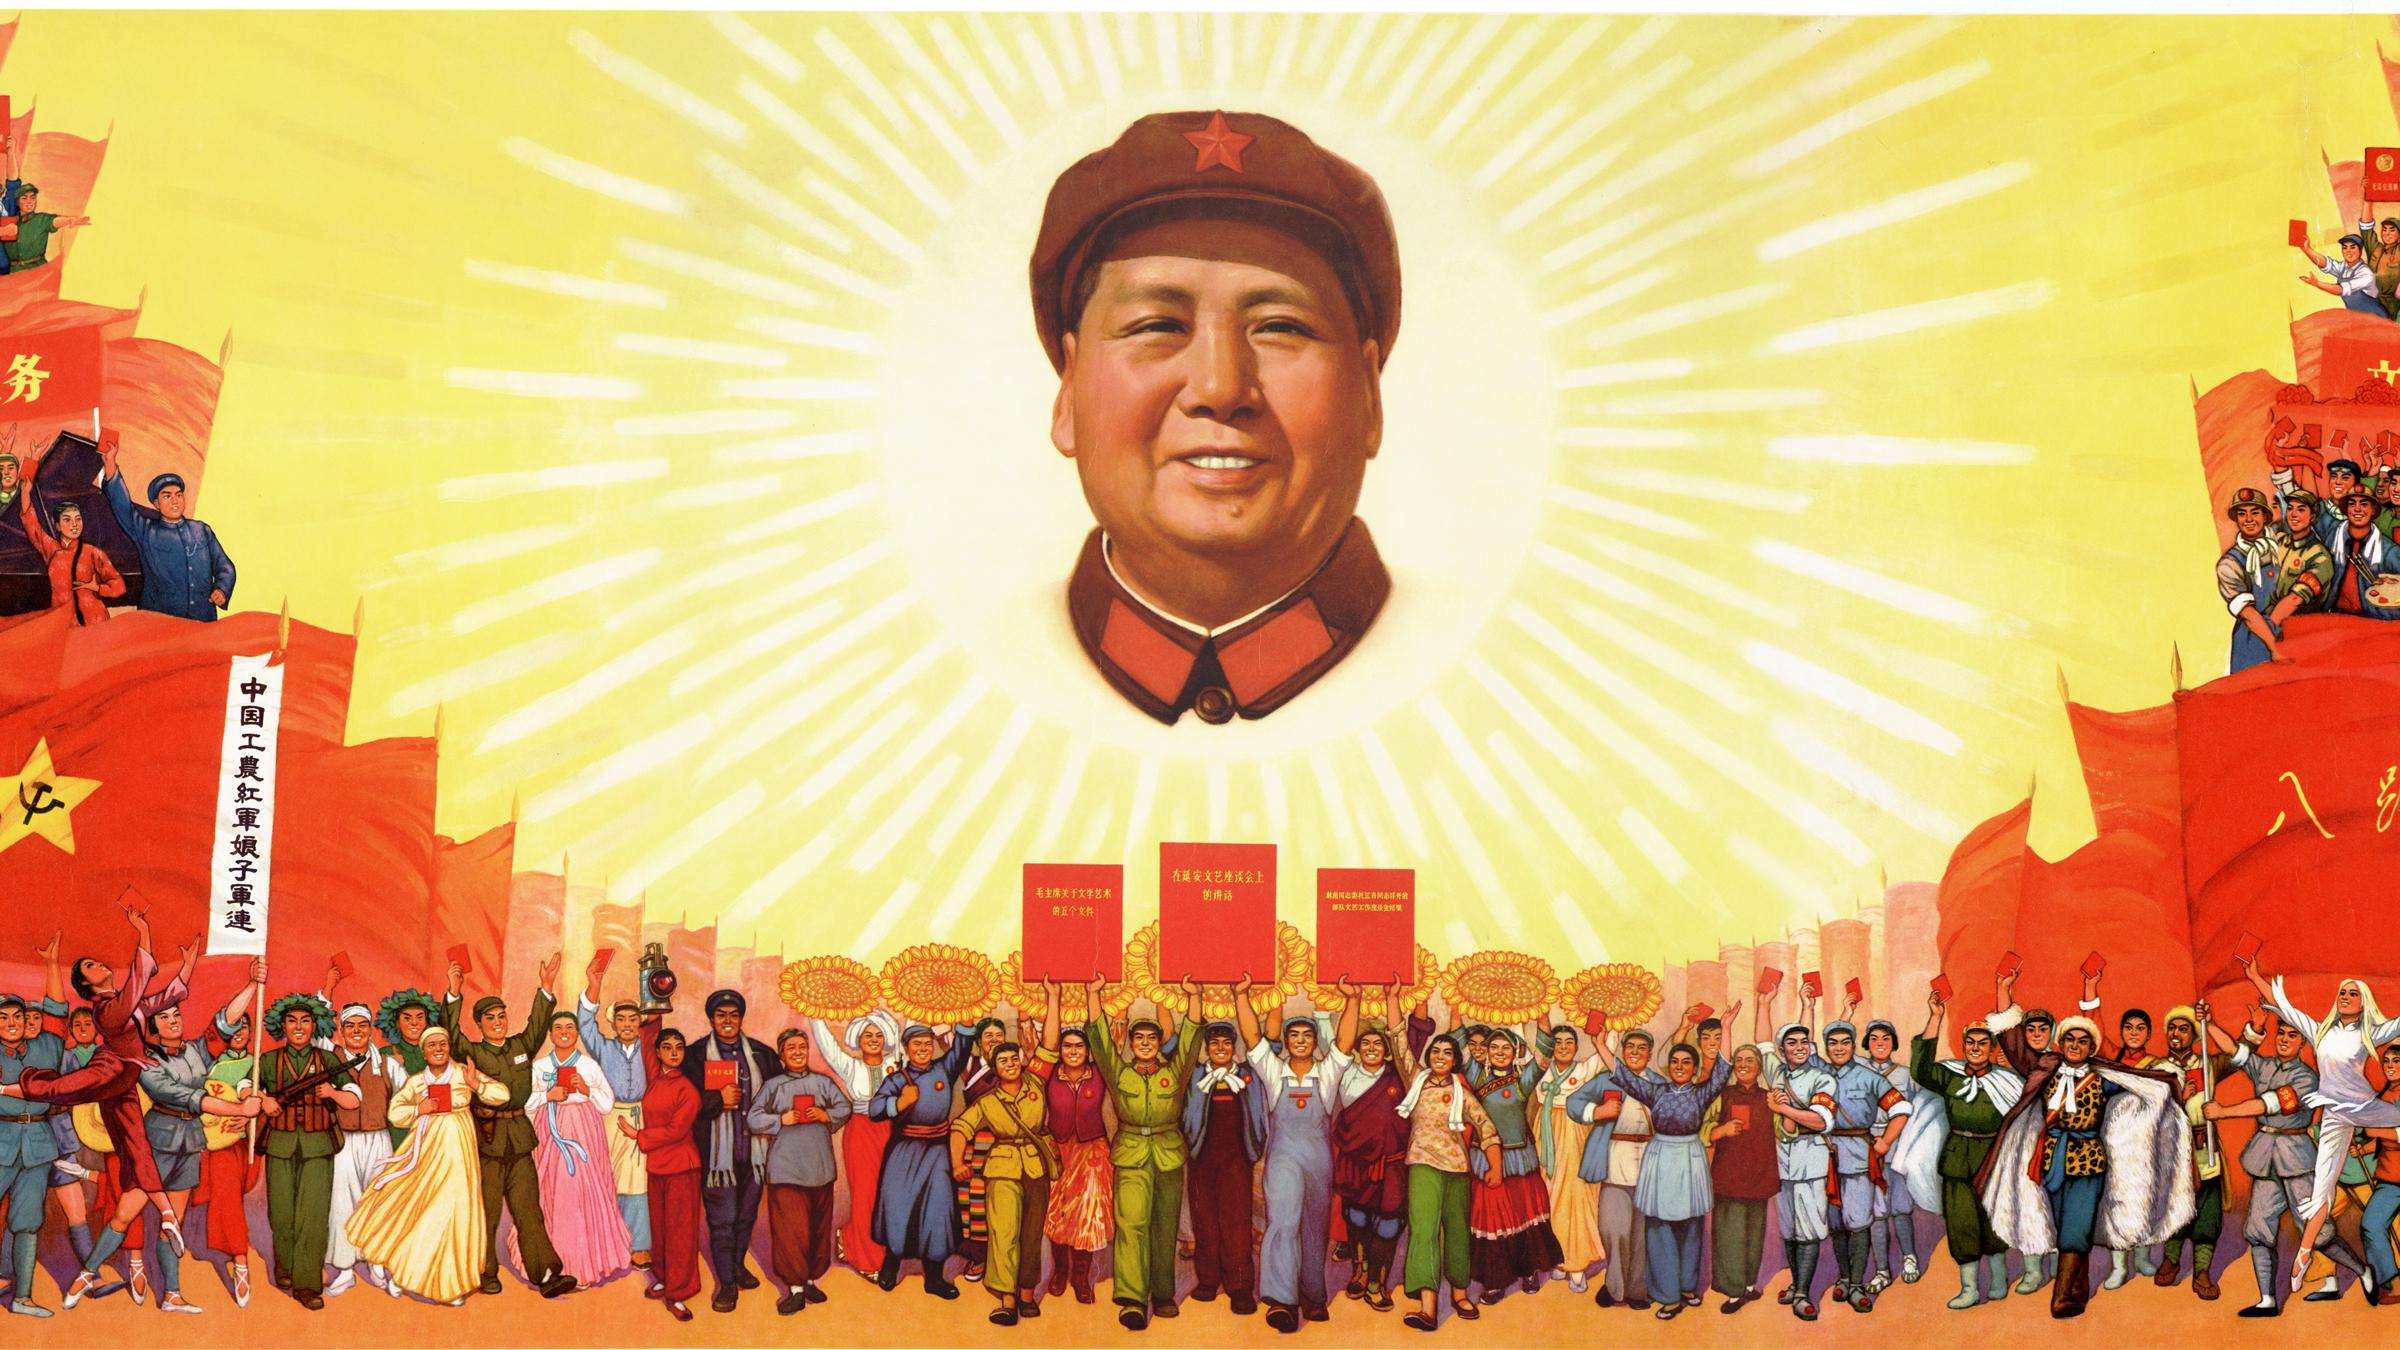 external image Mao%20as%20the%20Sun%202400x1300%20px.jpg